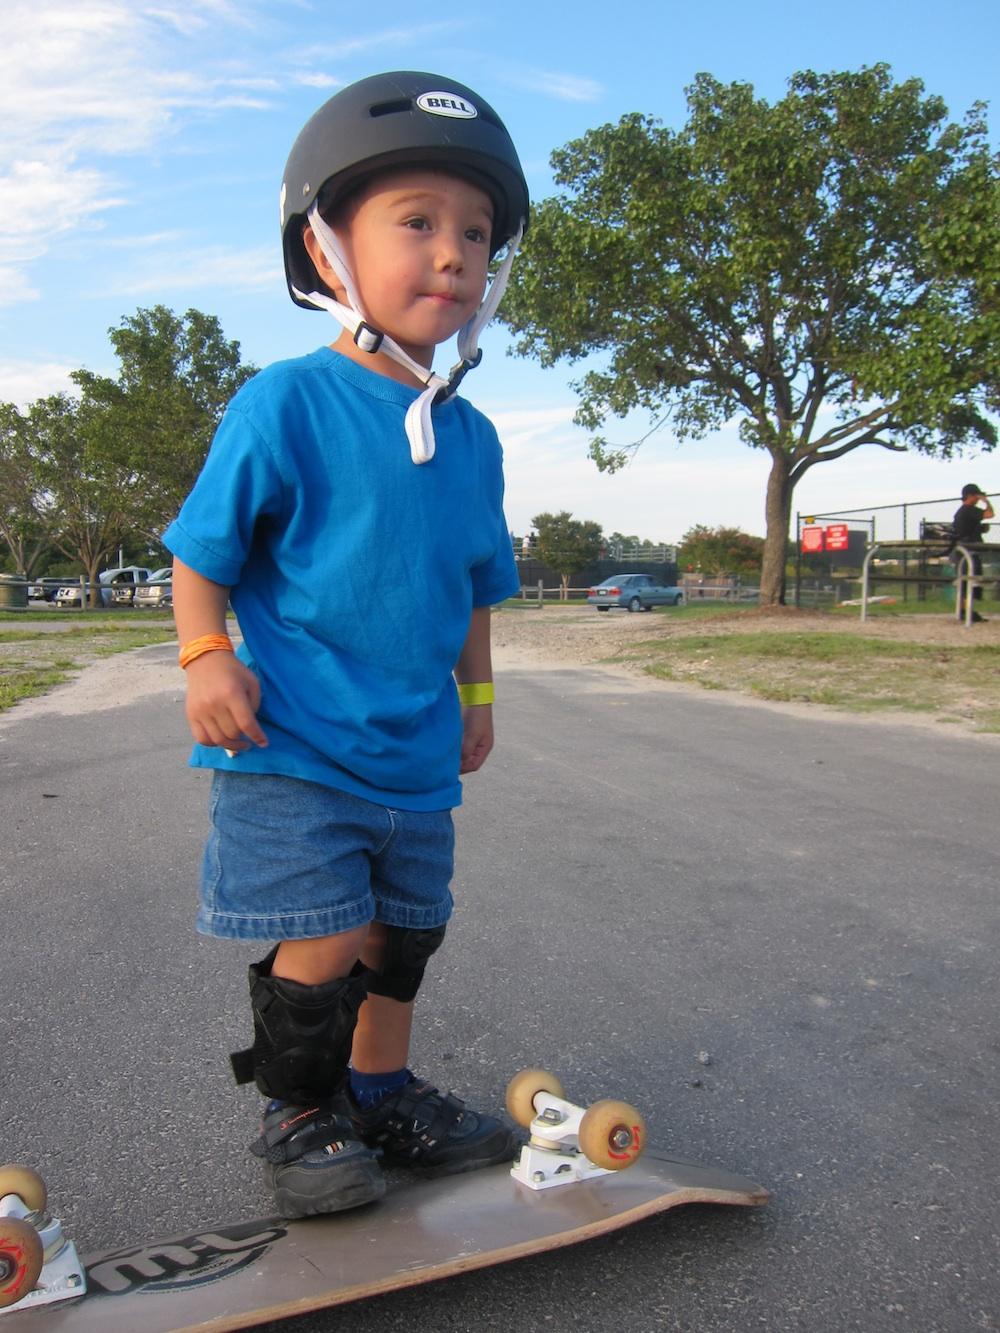 ethan skateboard